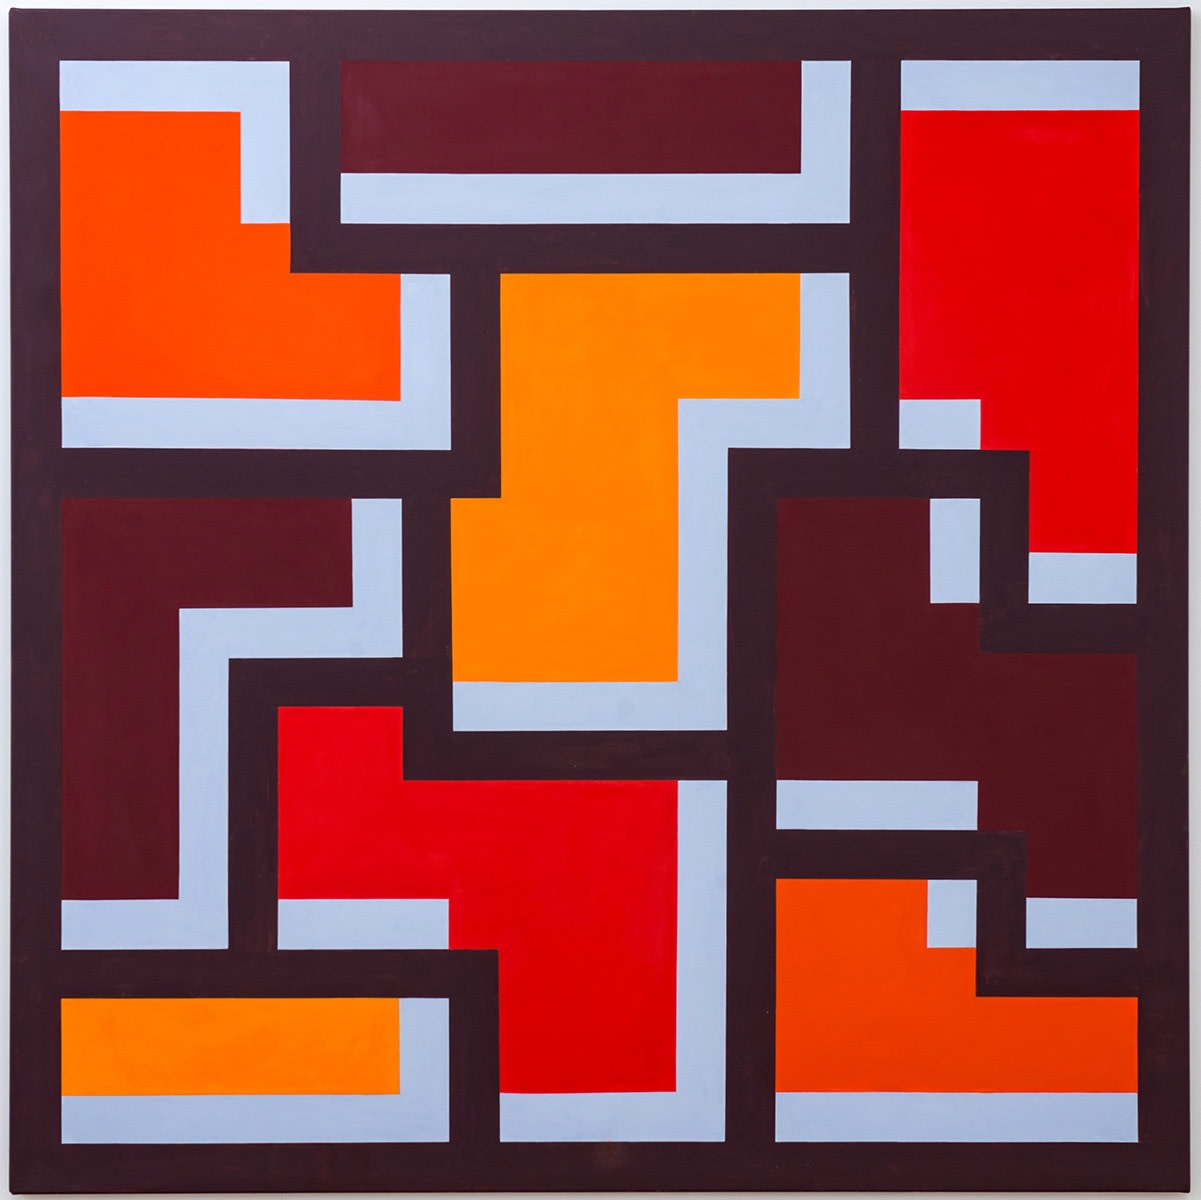 Mary Webb, UTAH VI (Third Version), 2017, Oil on canvas, 180 x 180 cm, 70 7/8 x 70 7/8 in